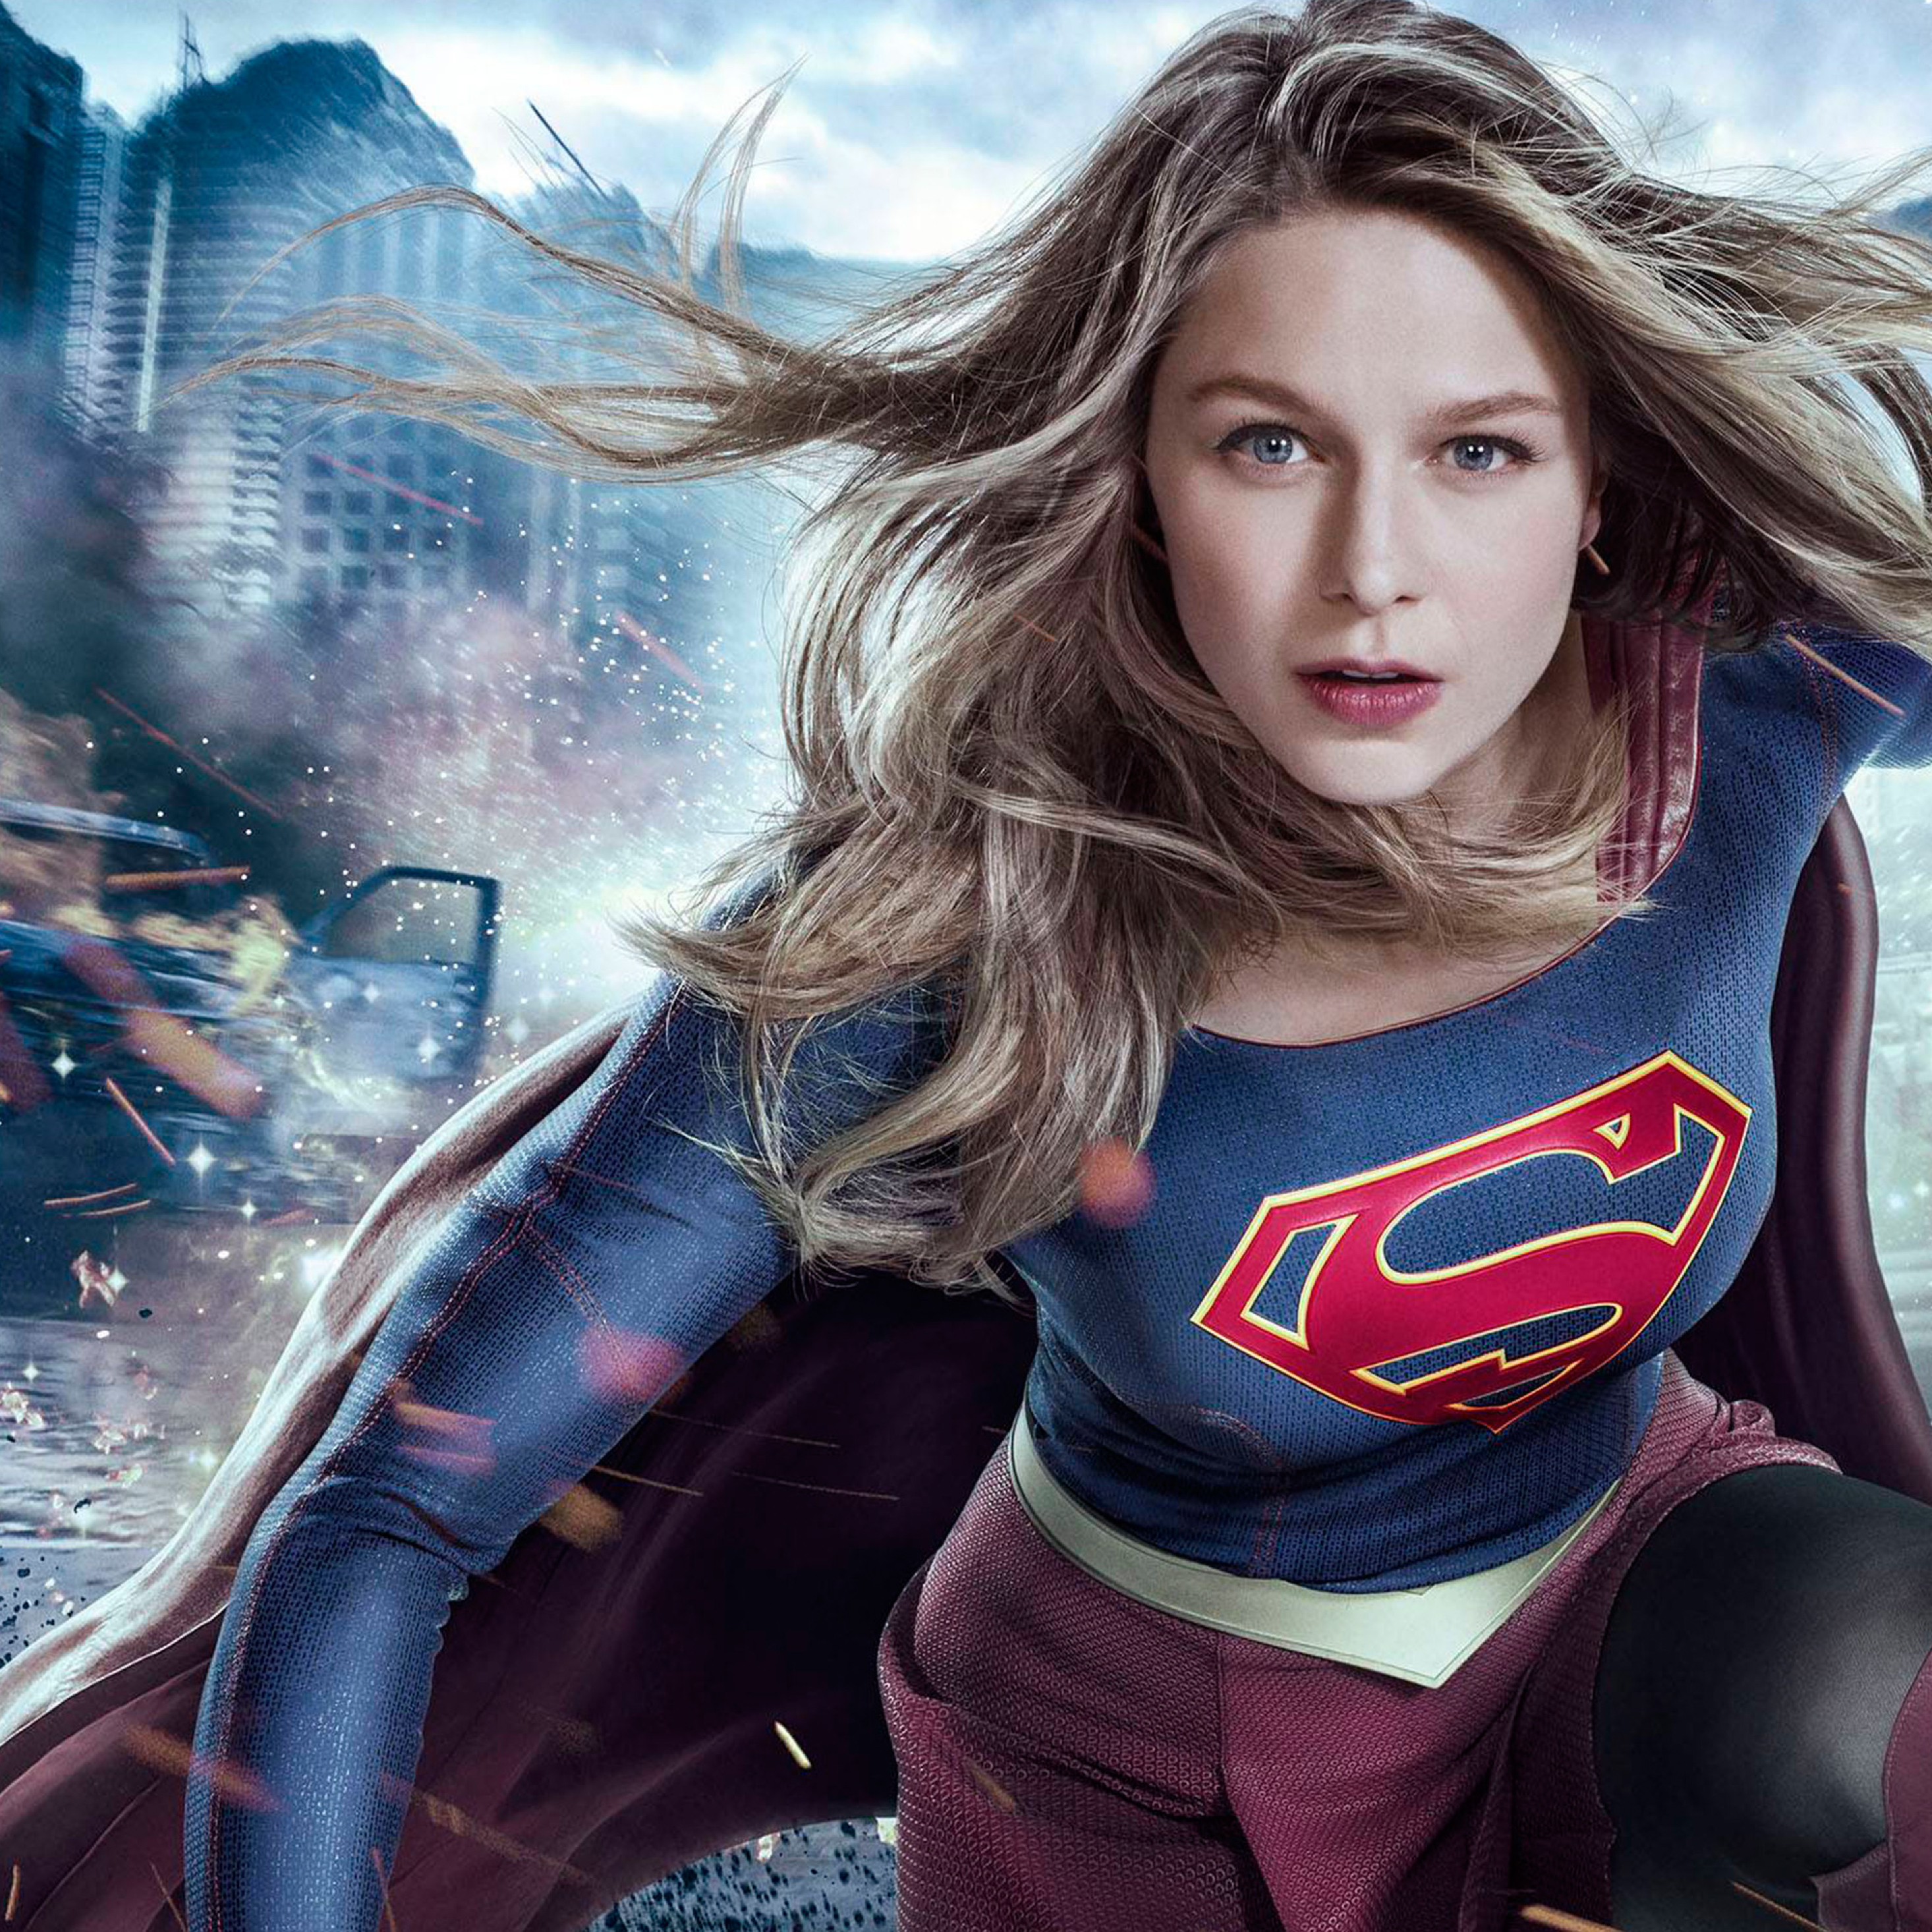 Lucifer Season 3 Hd 4k Wallpaper: Supergirl Melissa Benoist Season 3 2017, HD 4K Wallpaper